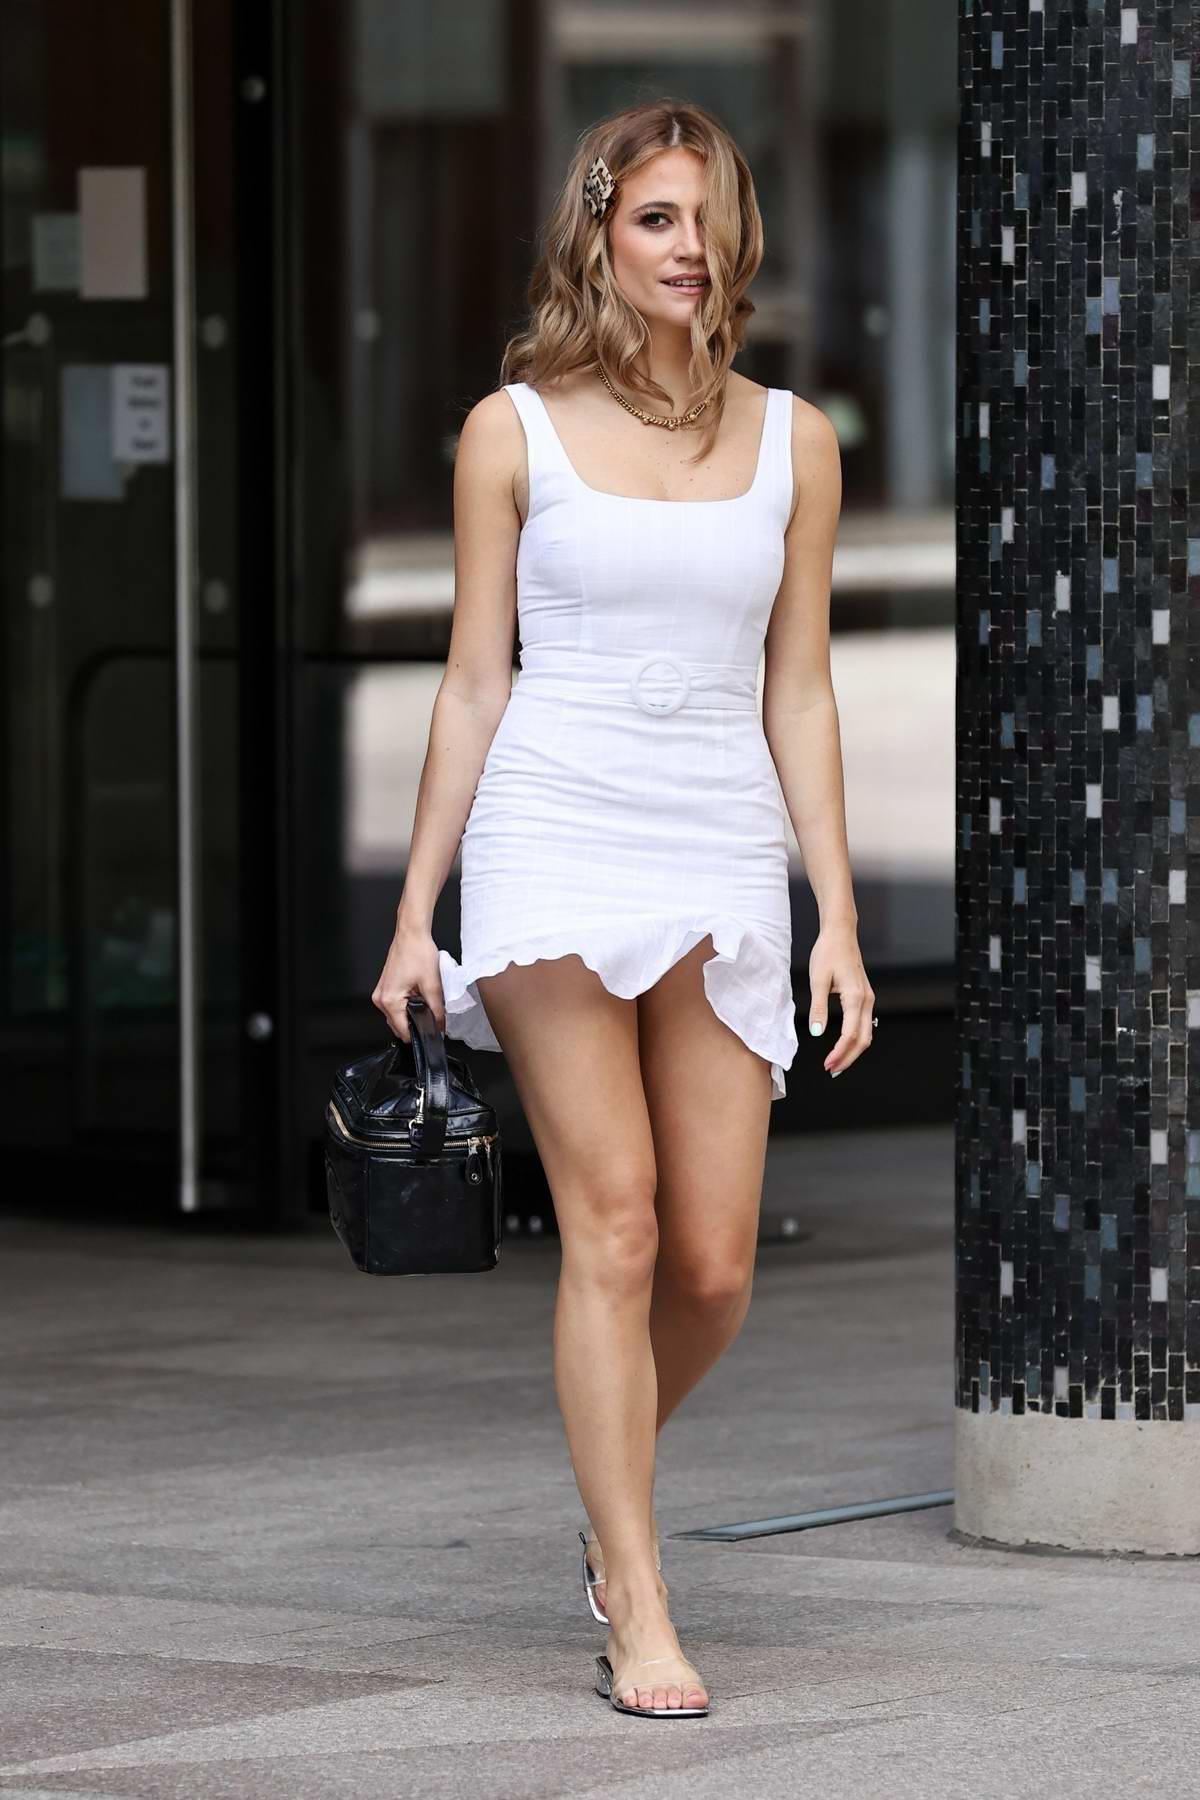 Pixie Lott looks stunning in a white mini dress as she leaves the Sunday Brunch TV show in London, UK